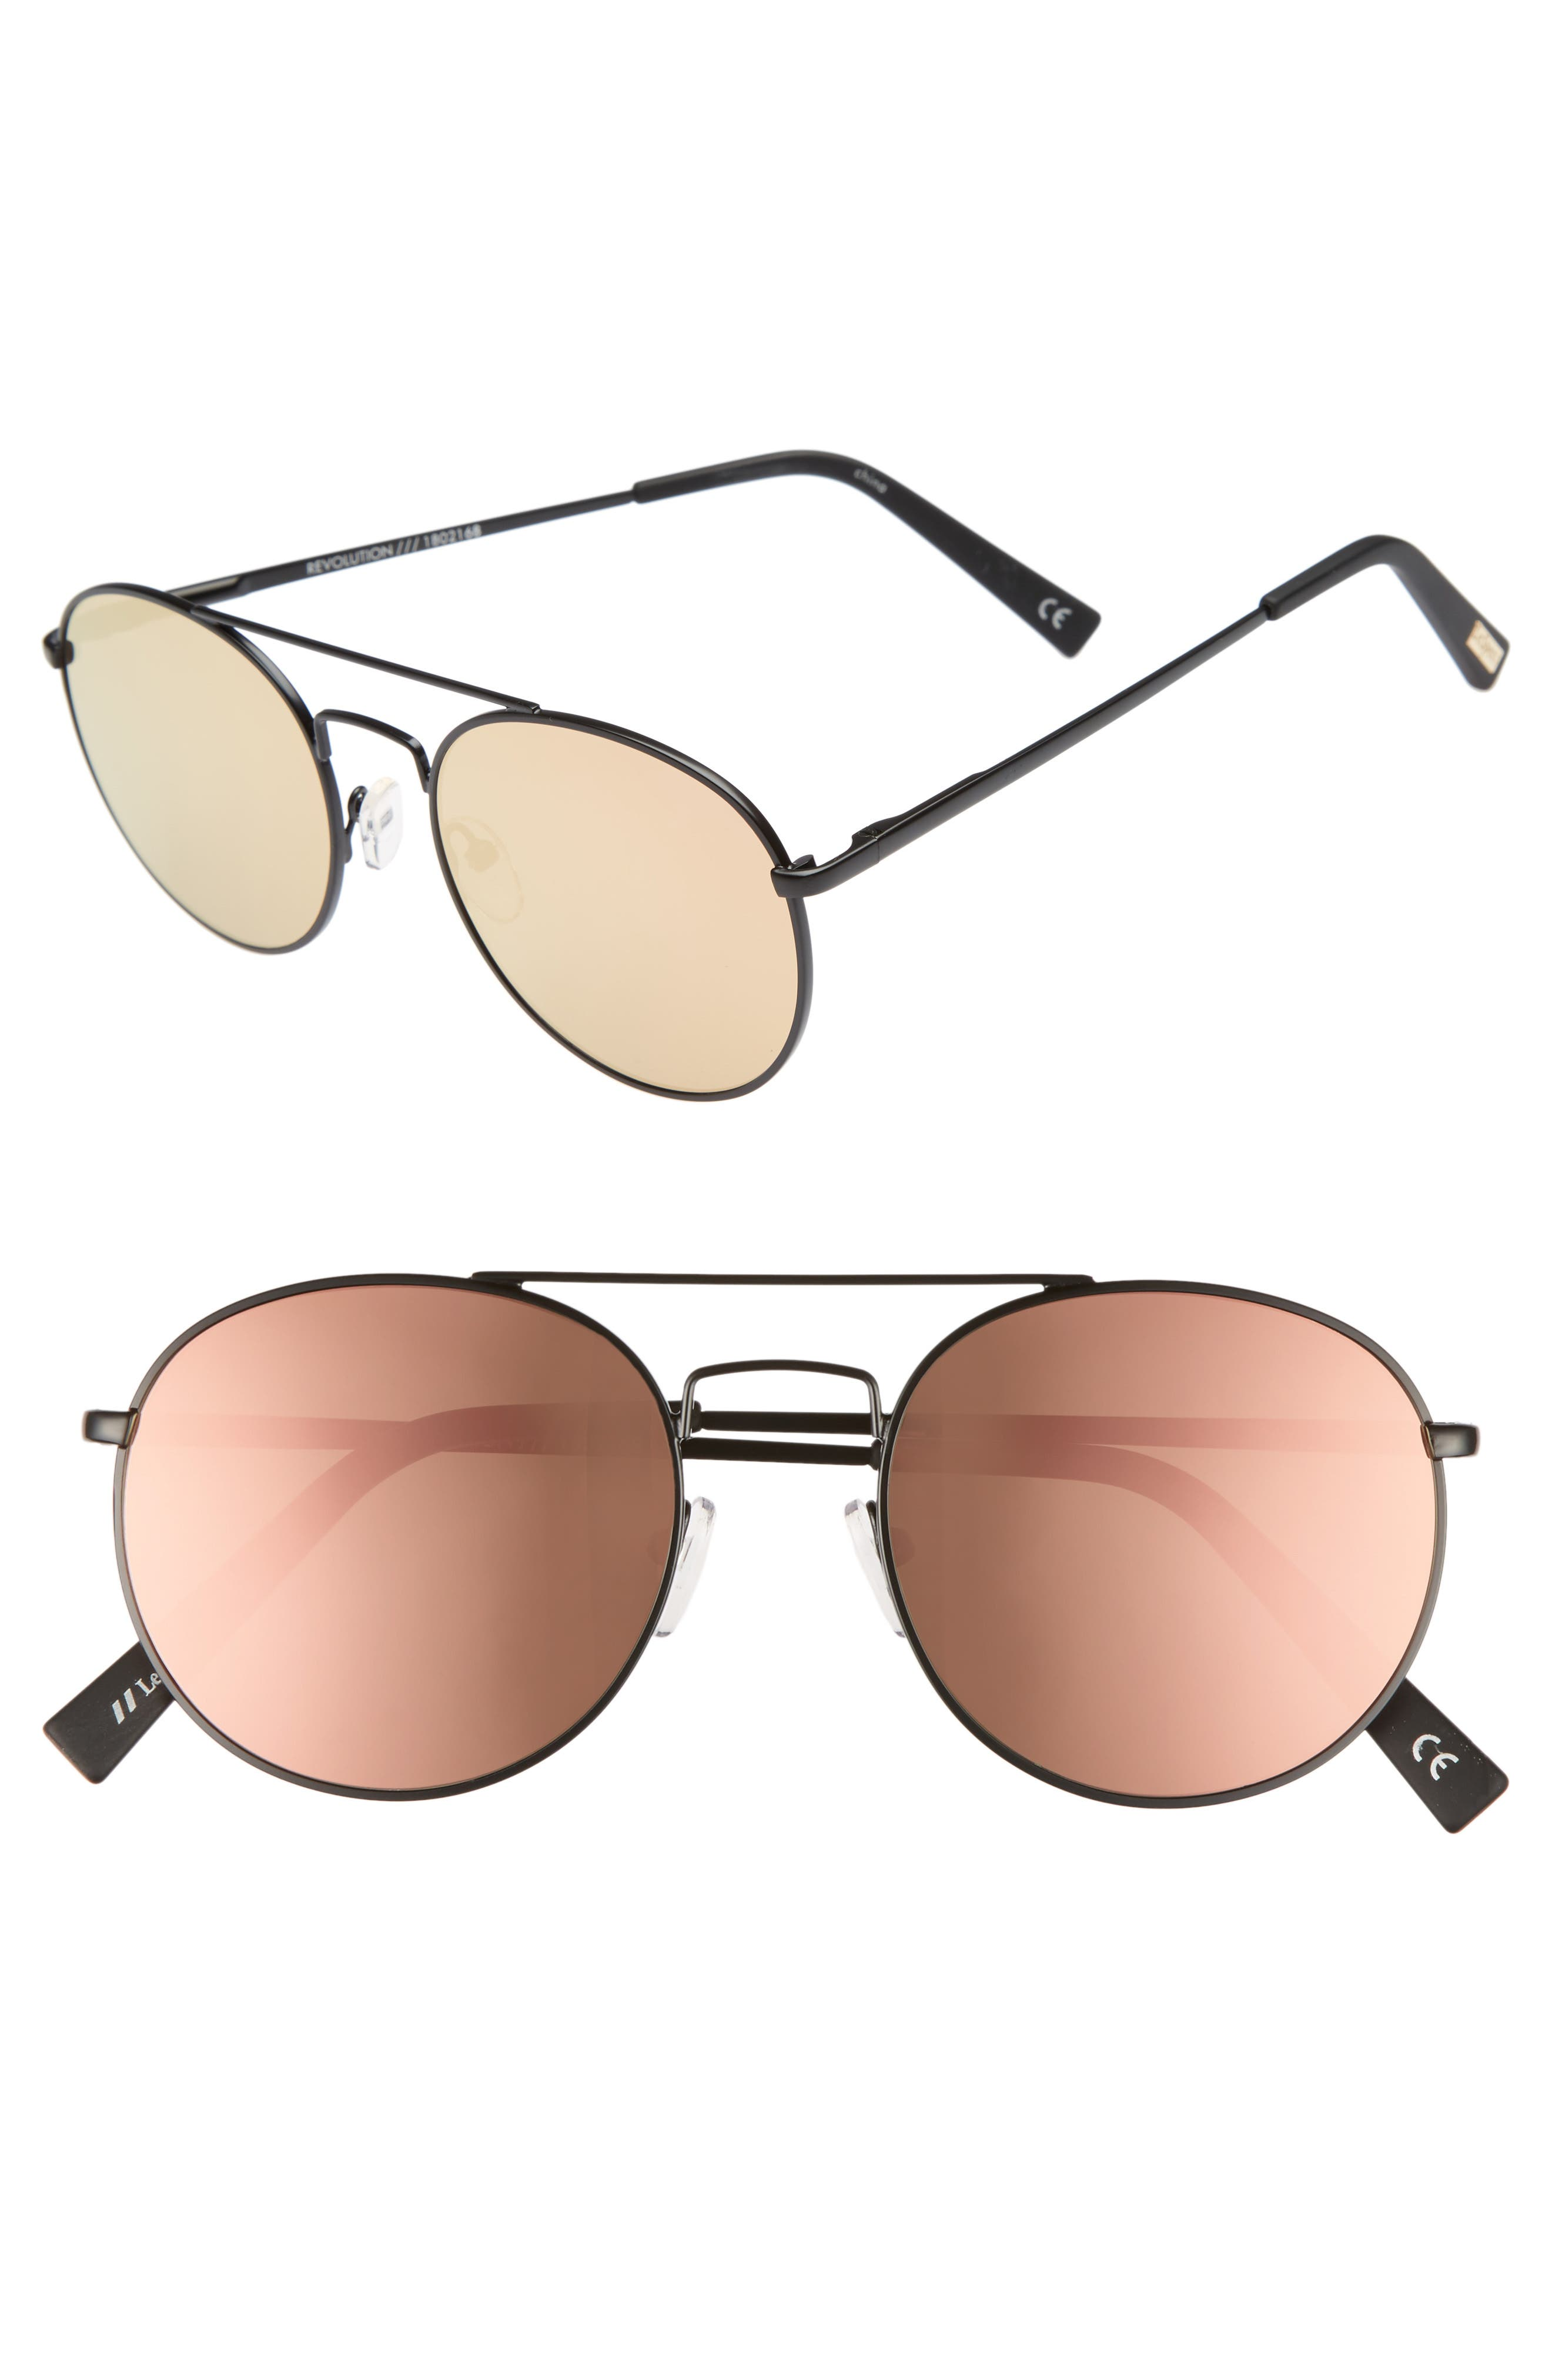 Revolution 53mm Aviator Sunglasses,                             Main thumbnail 1, color,                             001